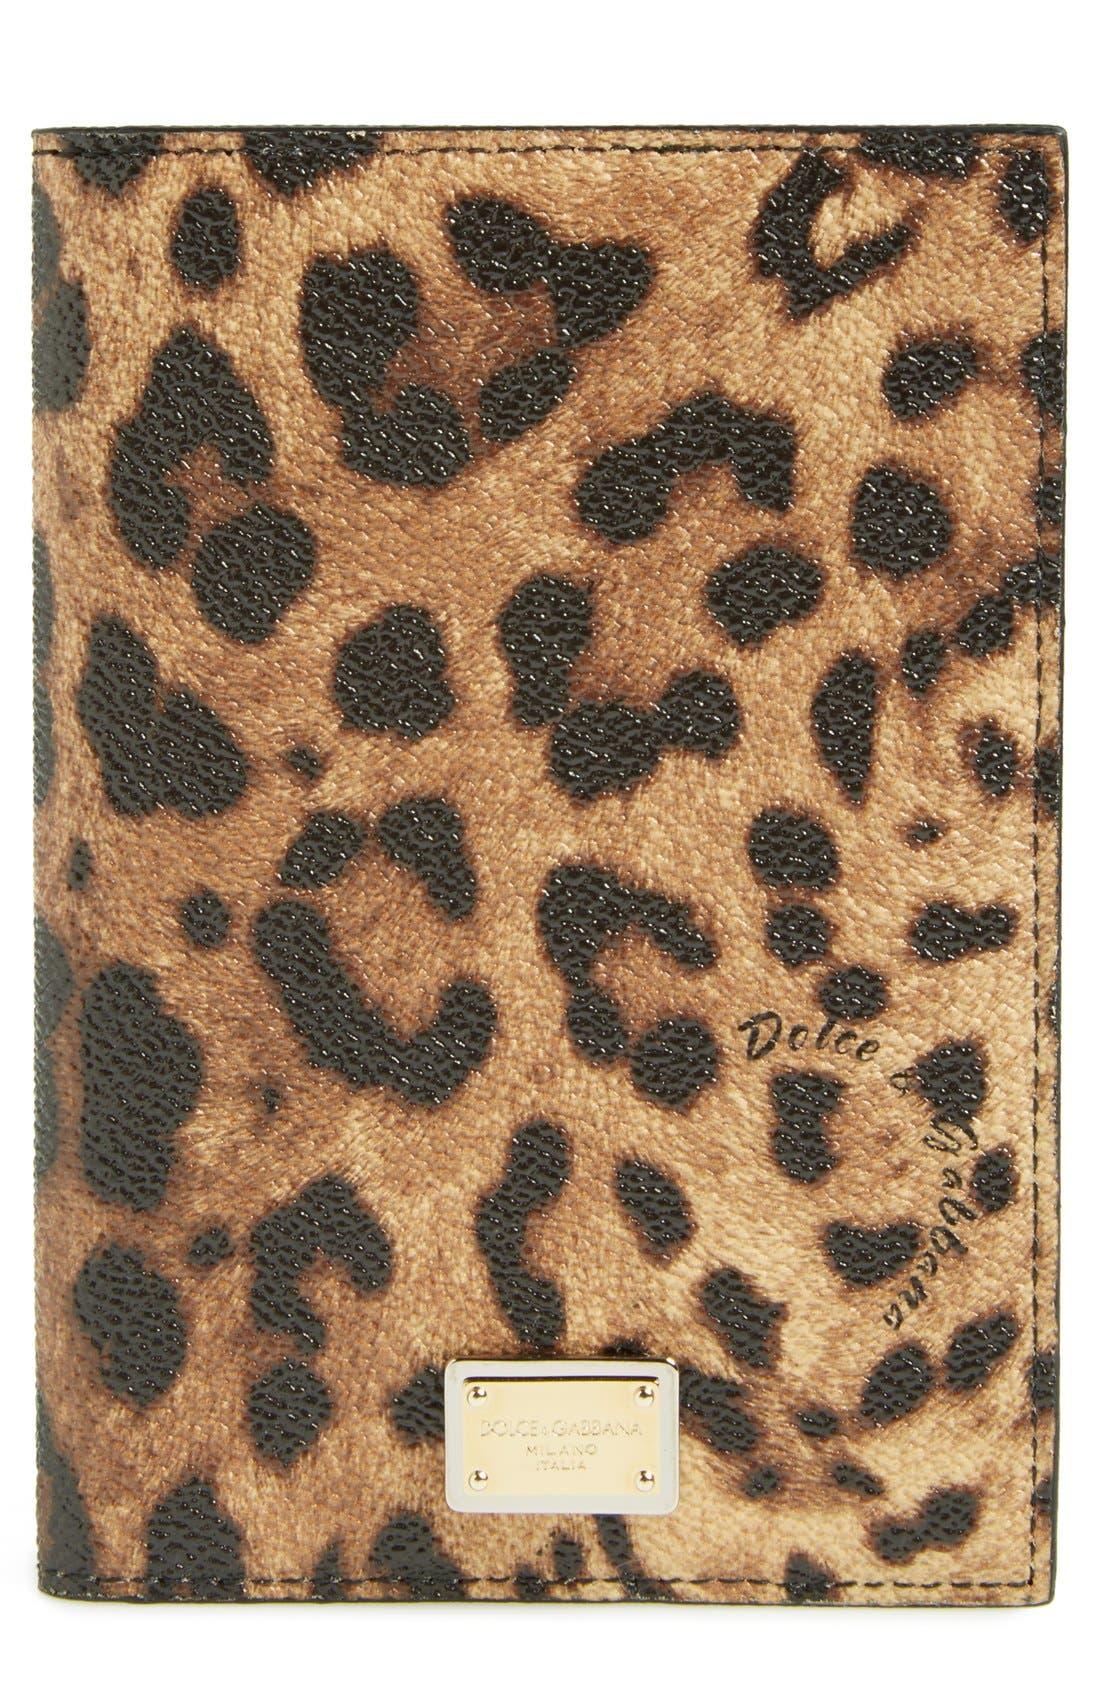 Alternate Image 1 Selected - Dolce&Gabbana Leopard Print Passport Cover